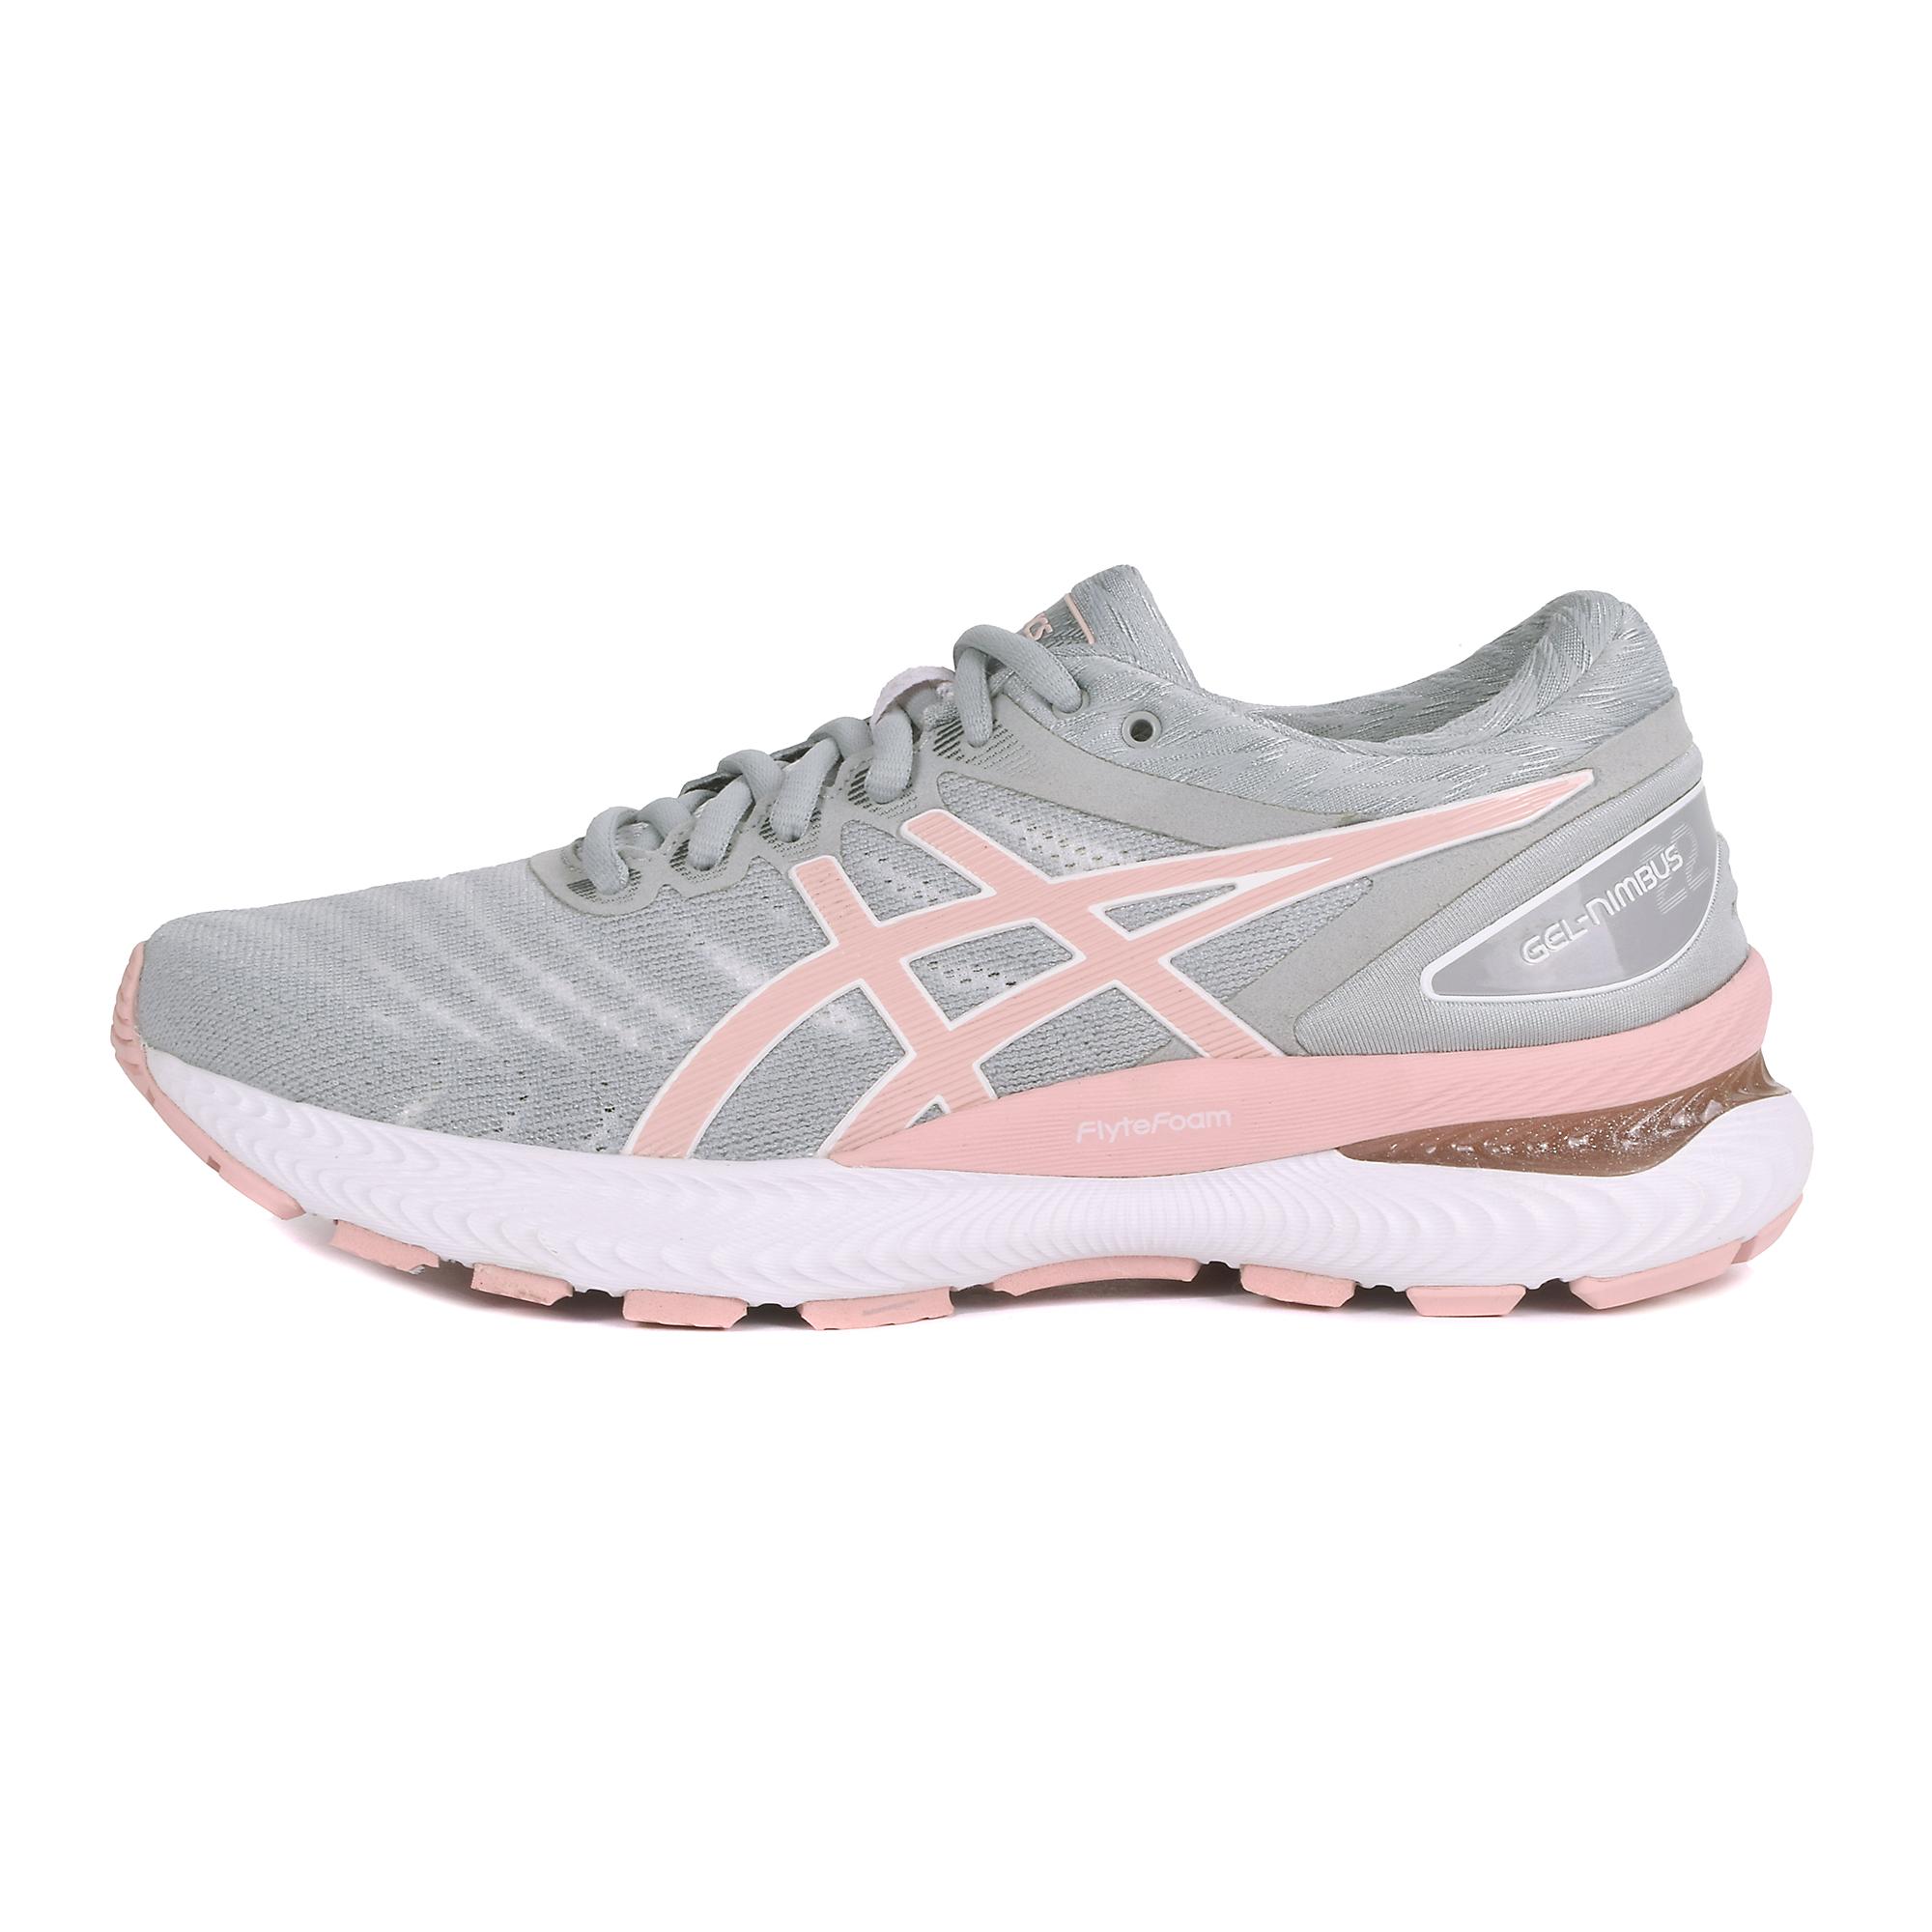 Women's Asics Gel-Nimbus 22 Running Shoe - Color: White/Rose Gold (Regular Width) - Size: 5, White, large, image 3